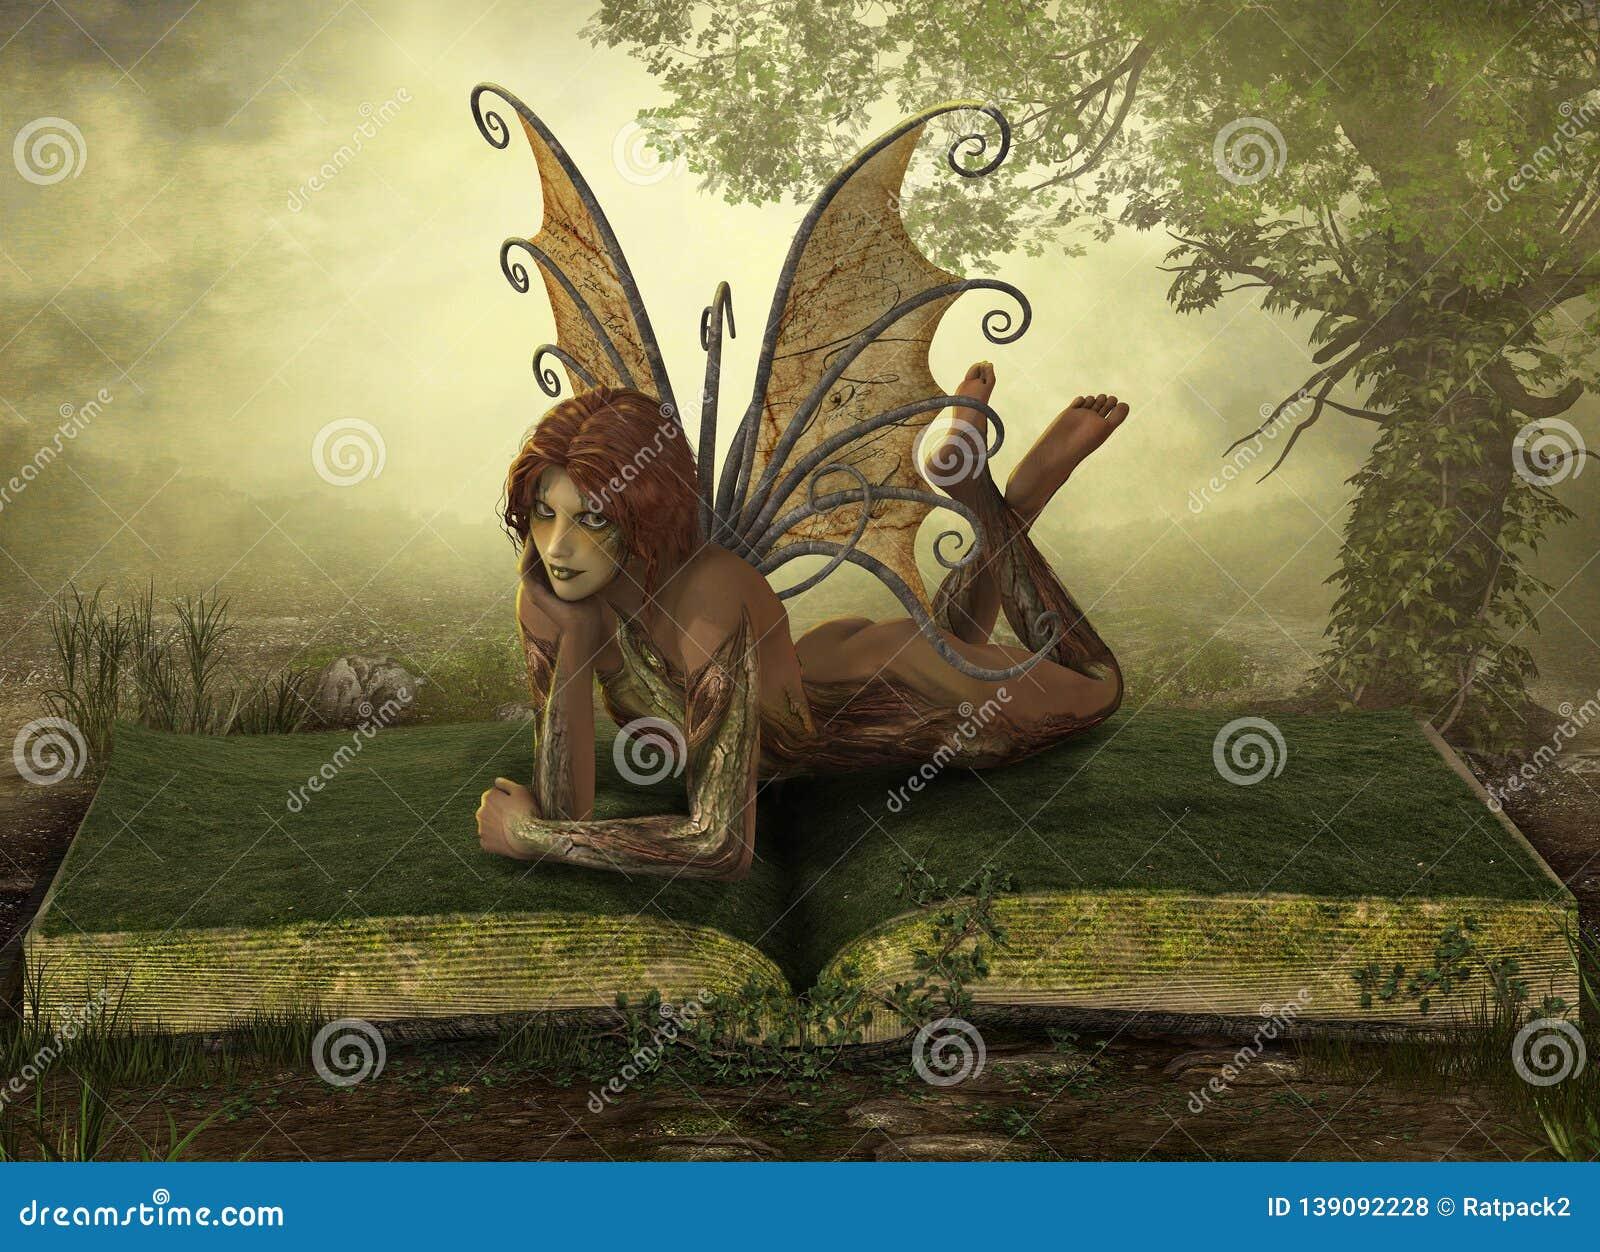 Enchanting Elemental Earth Fairy Fantasy